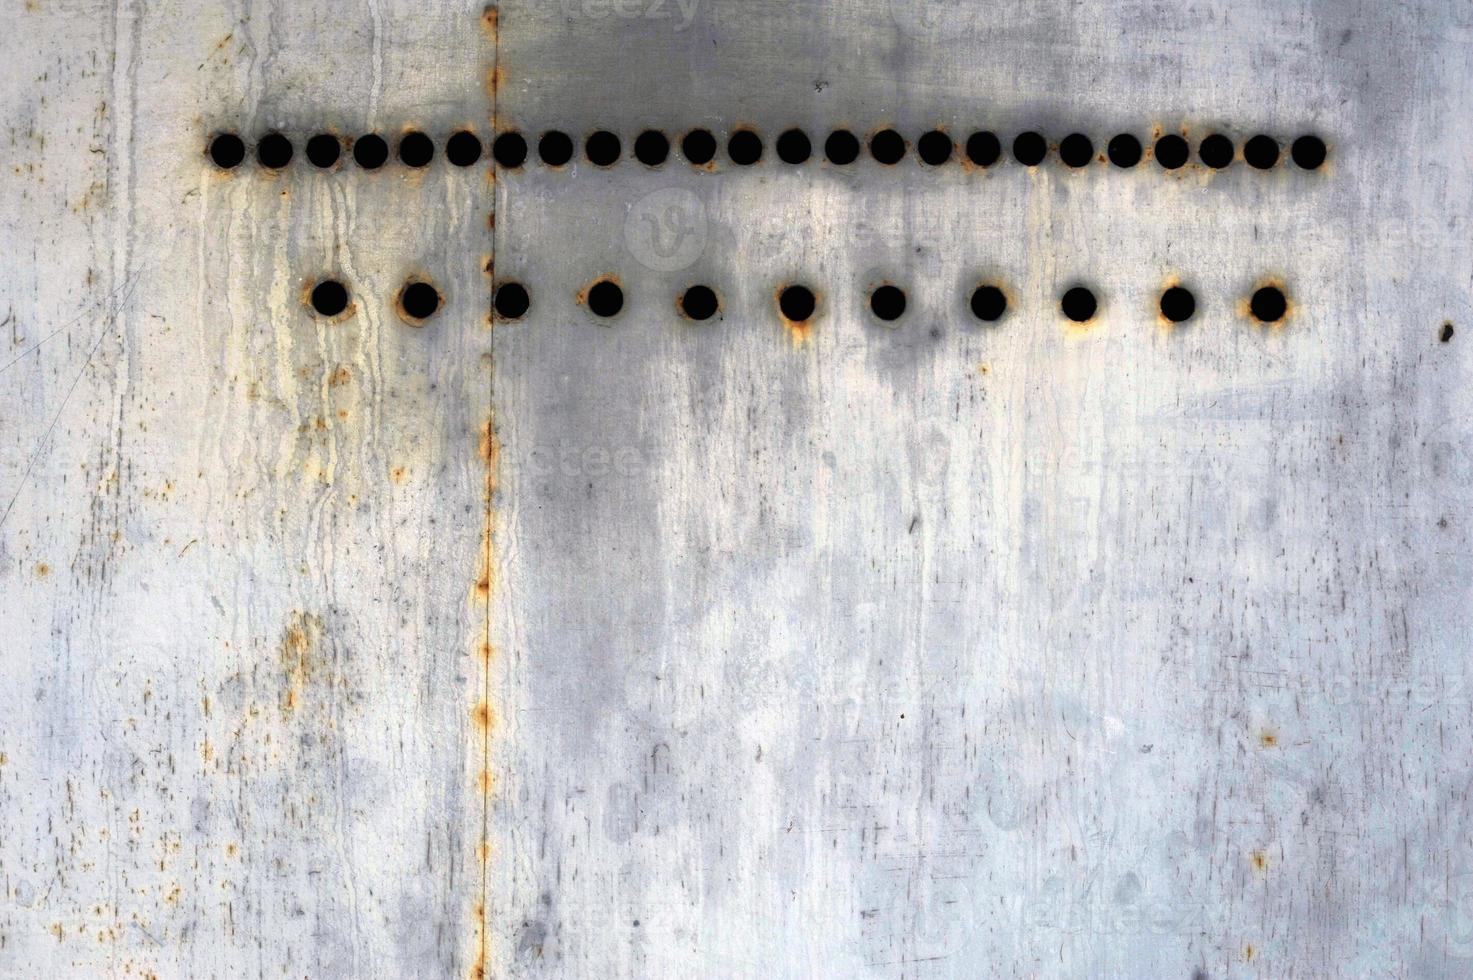 Rusty metall texture photo